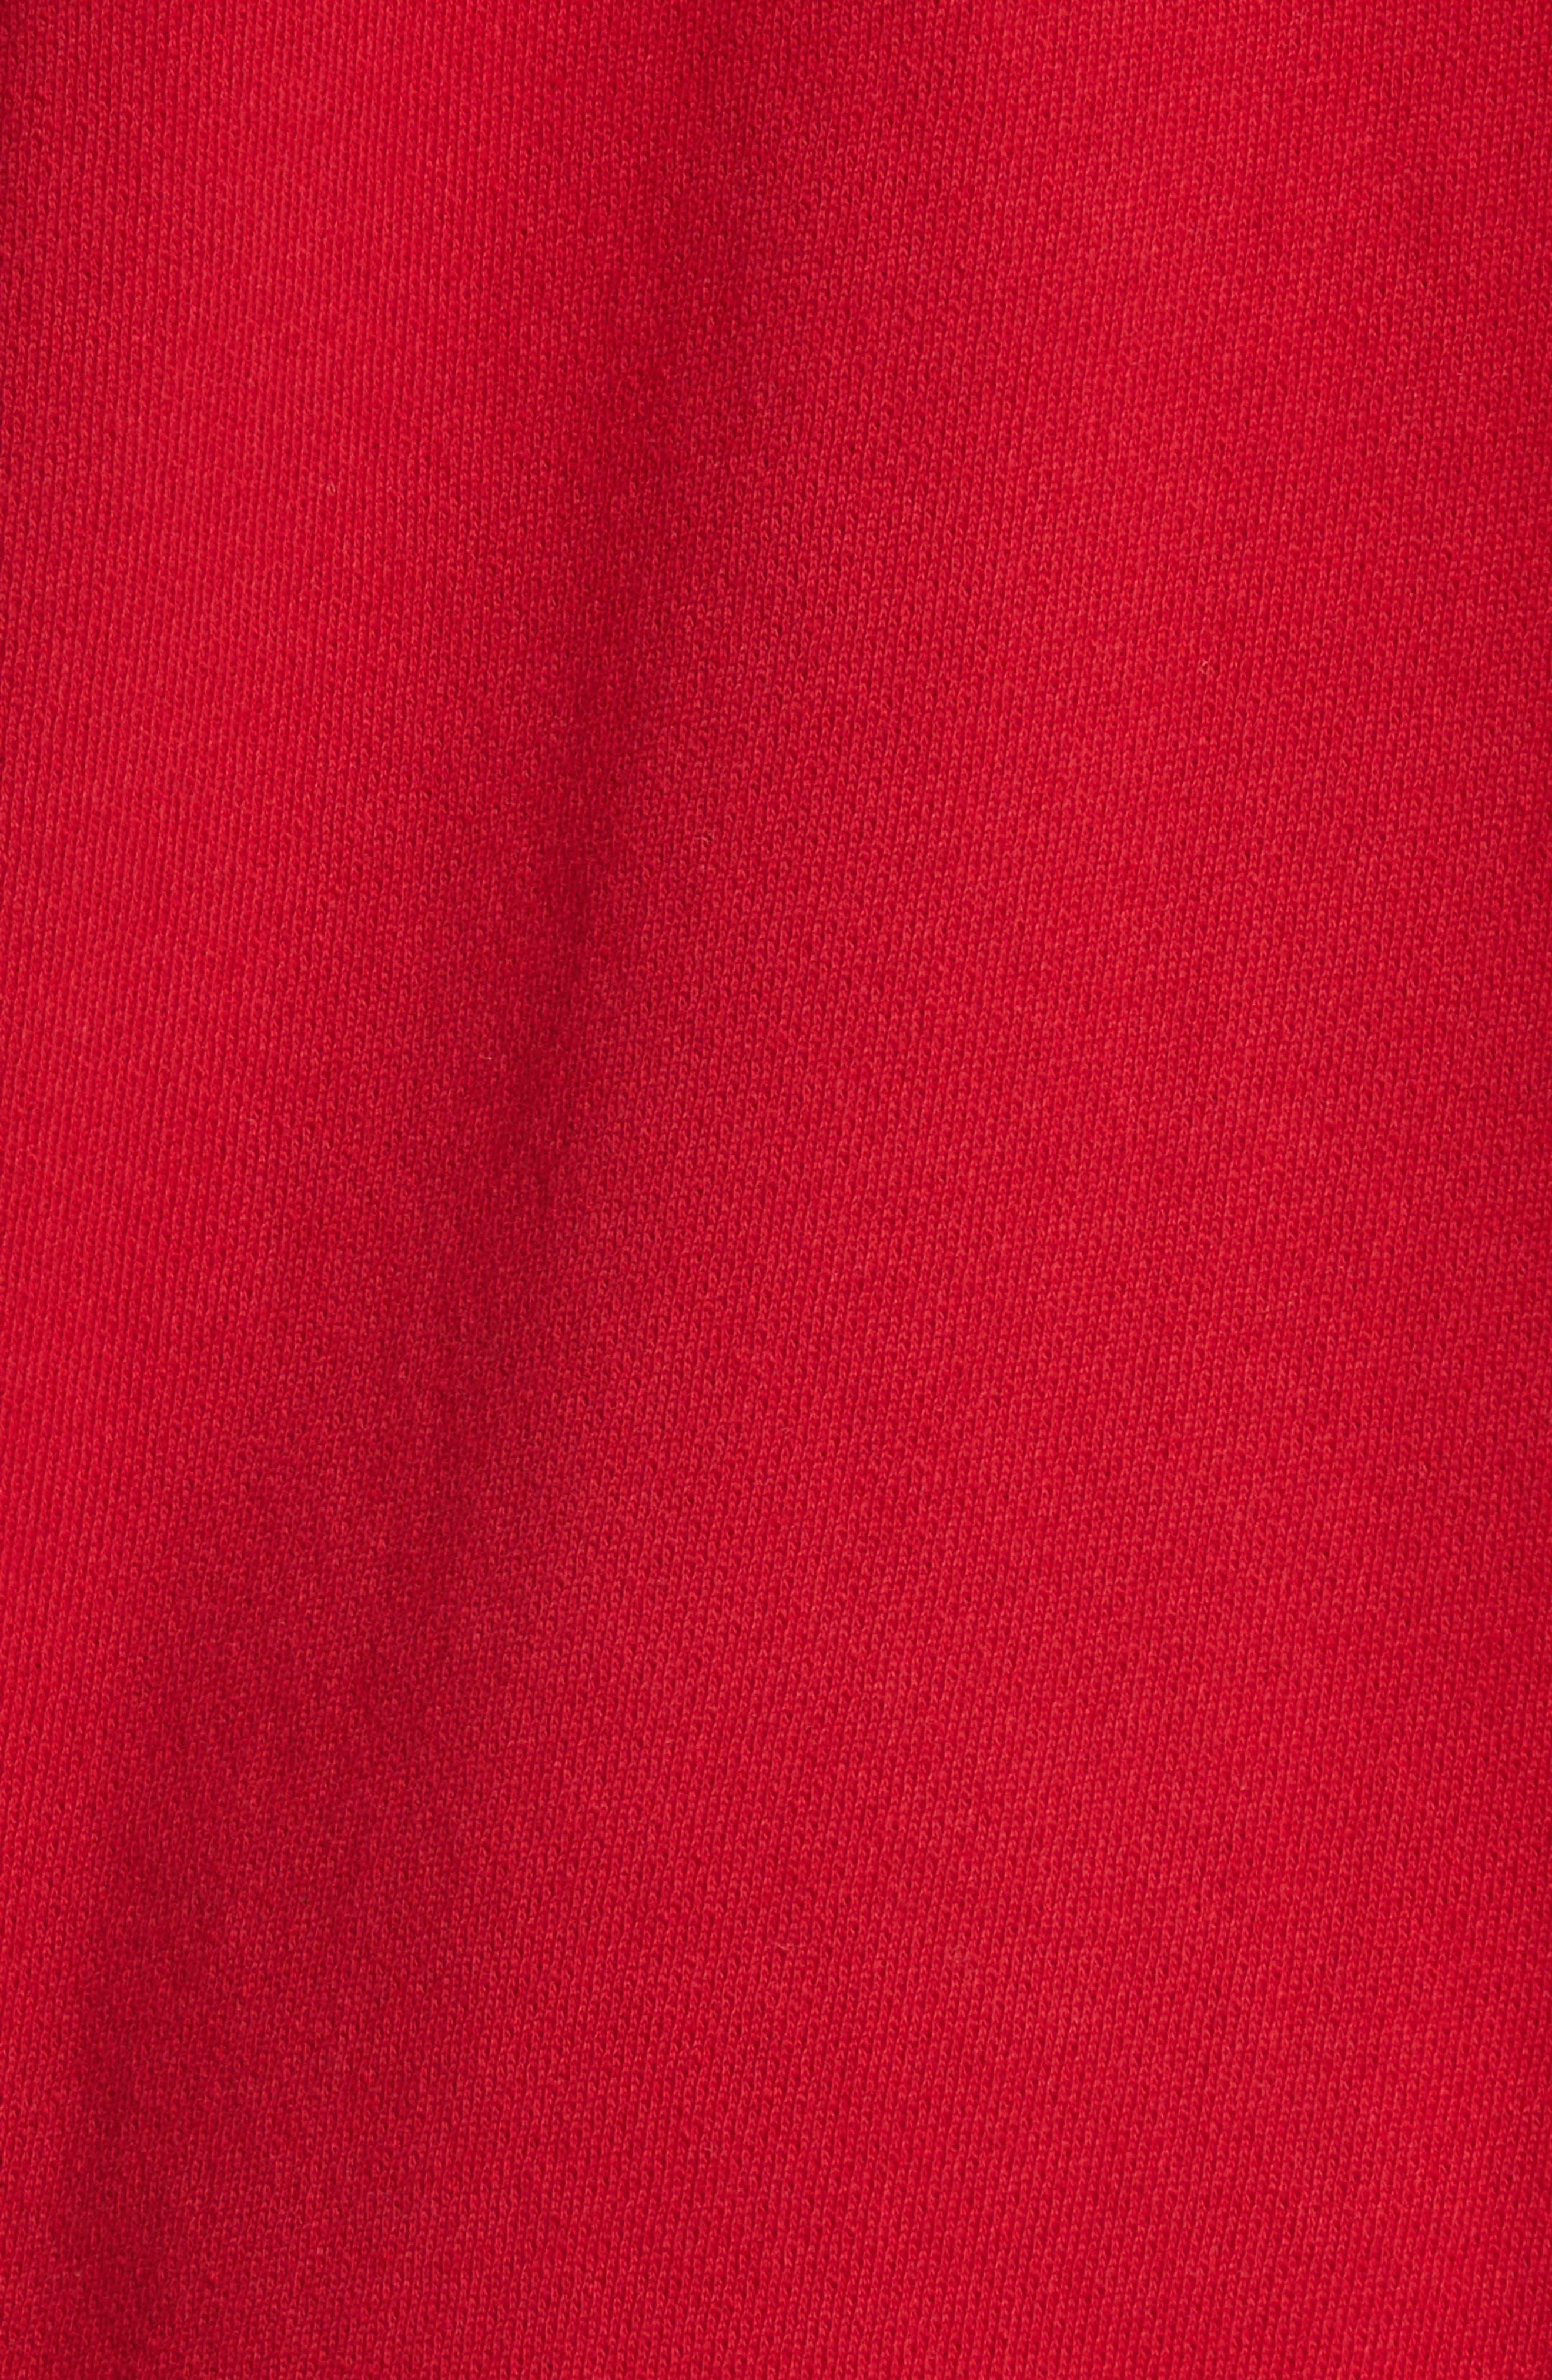 Adene Hooded Sweatshirt,                             Alternate thumbnail 5, color,                             Matador Red